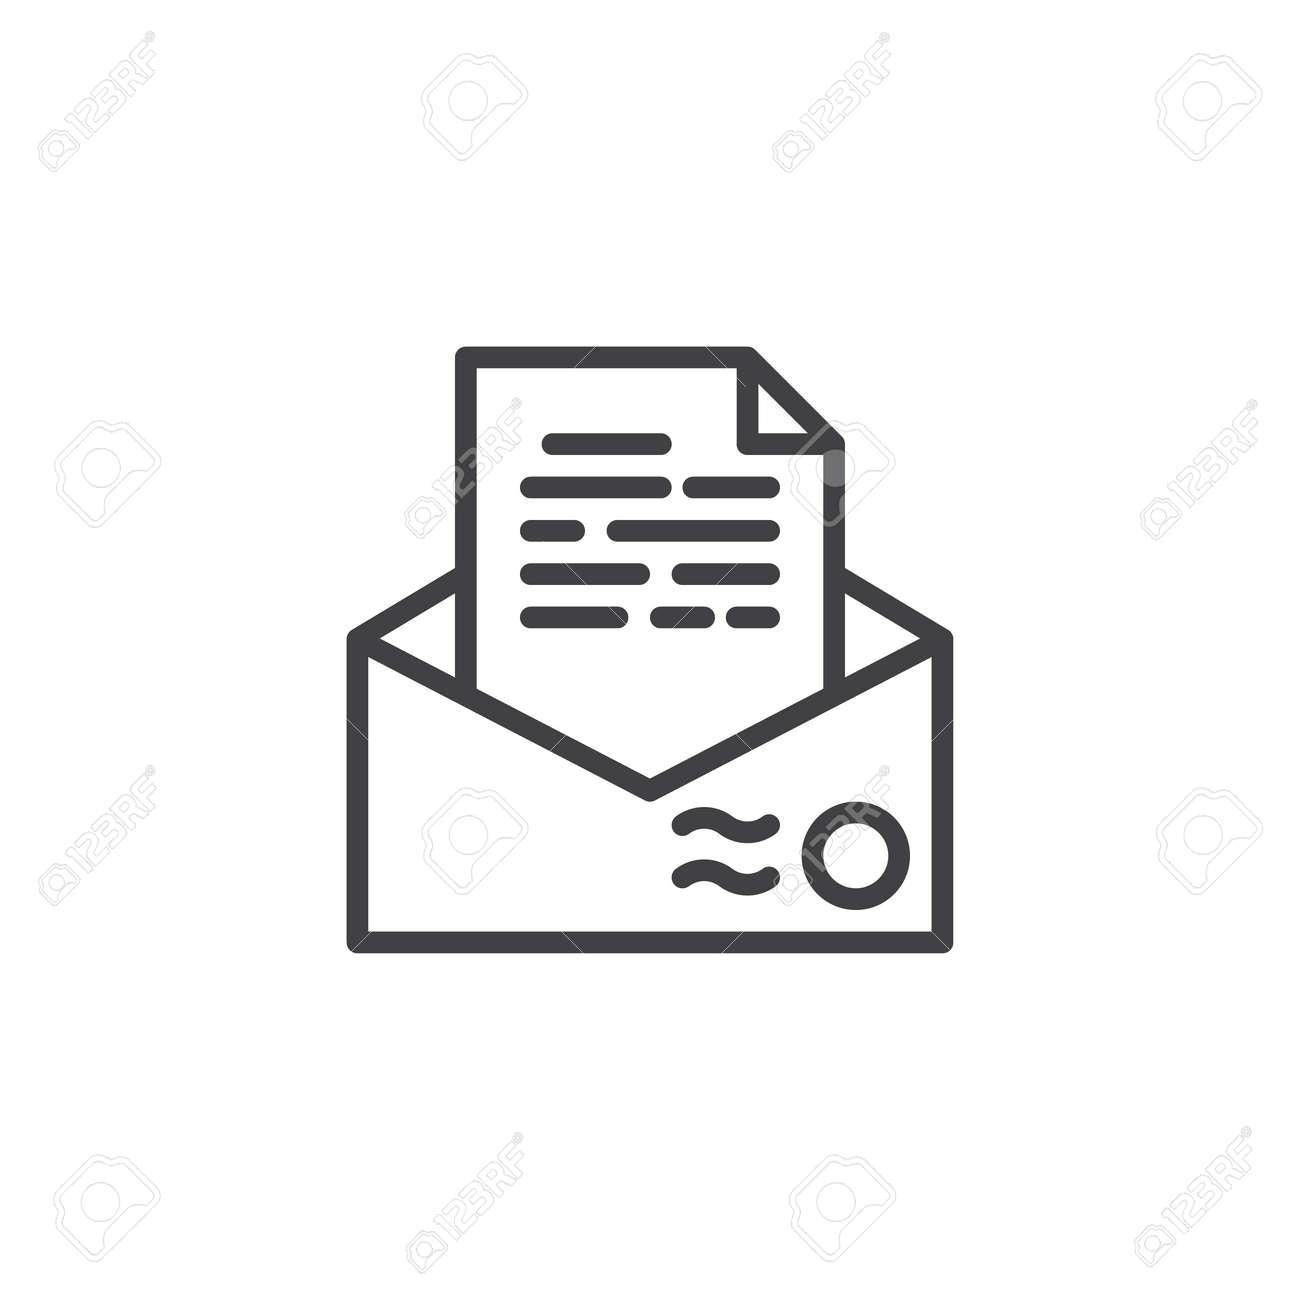 Recommendation Letter Envelope Line Icon Outline Vector Sign